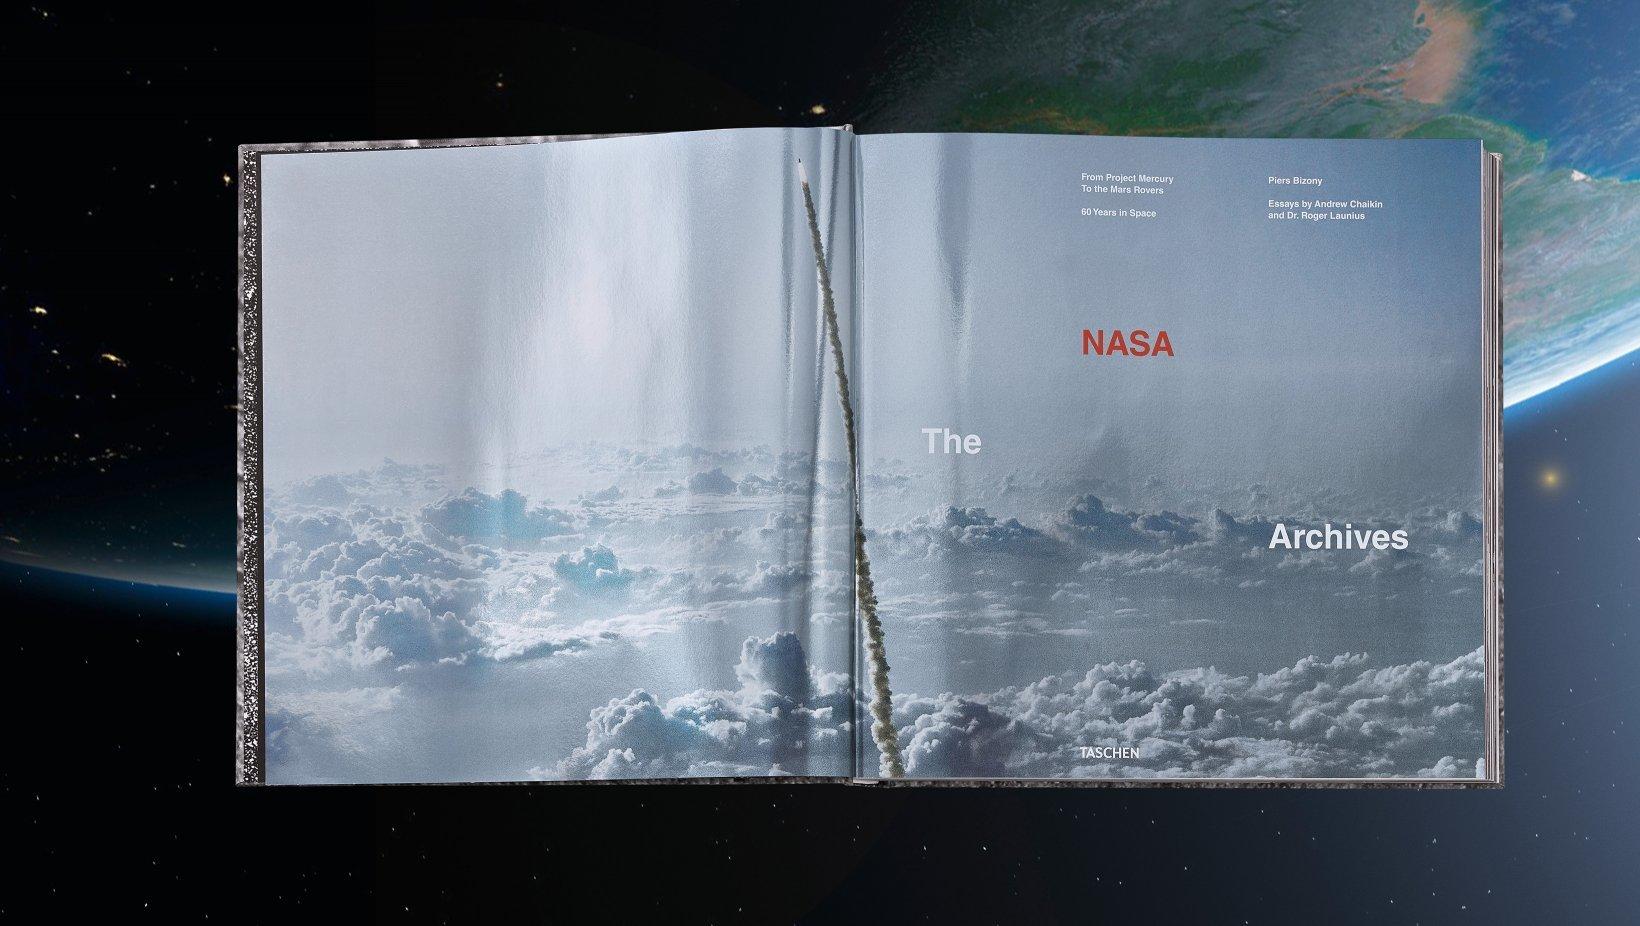 nasa-archives-taschen-3-img-min